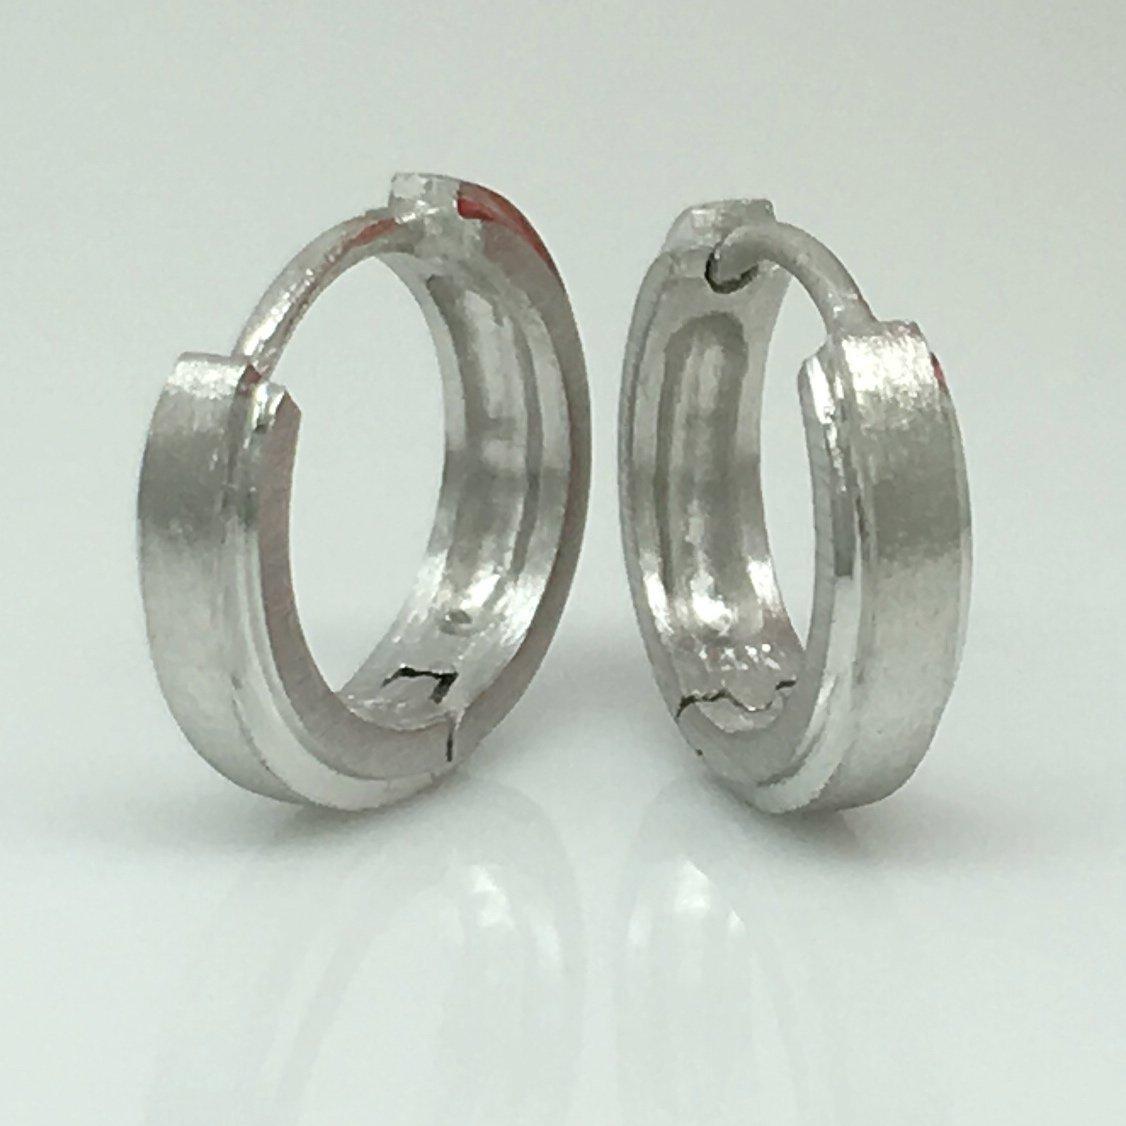 Mens white gold hoop earrings, small huggie hoop earrings, E002MW